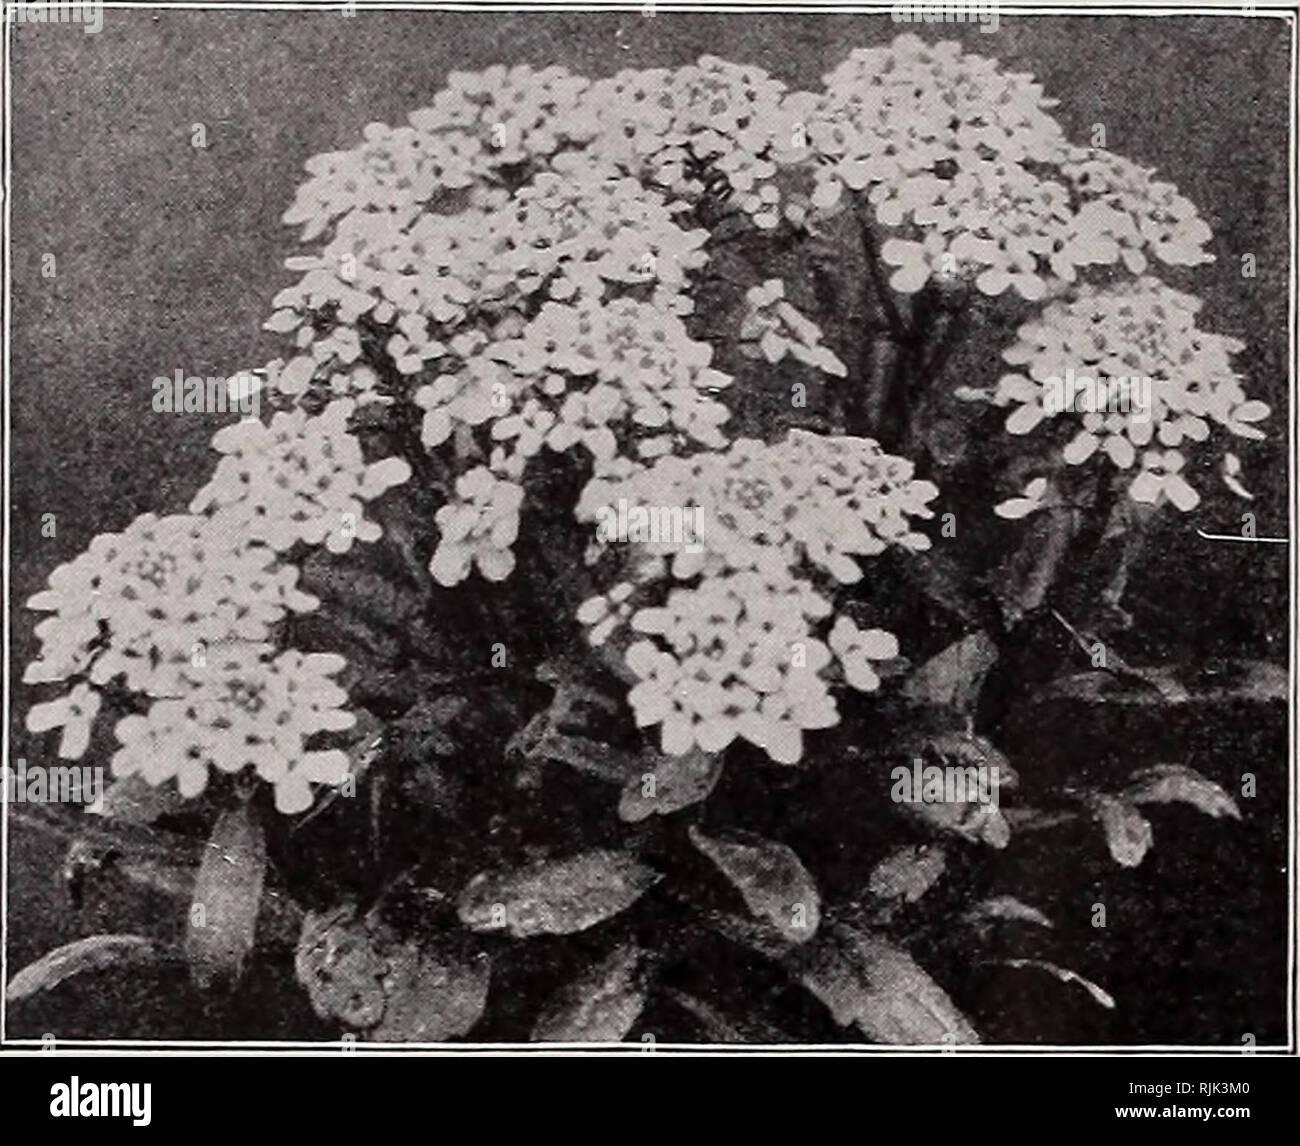 beckert's seeds : garden flower and lawn. commercial catalogs seeds